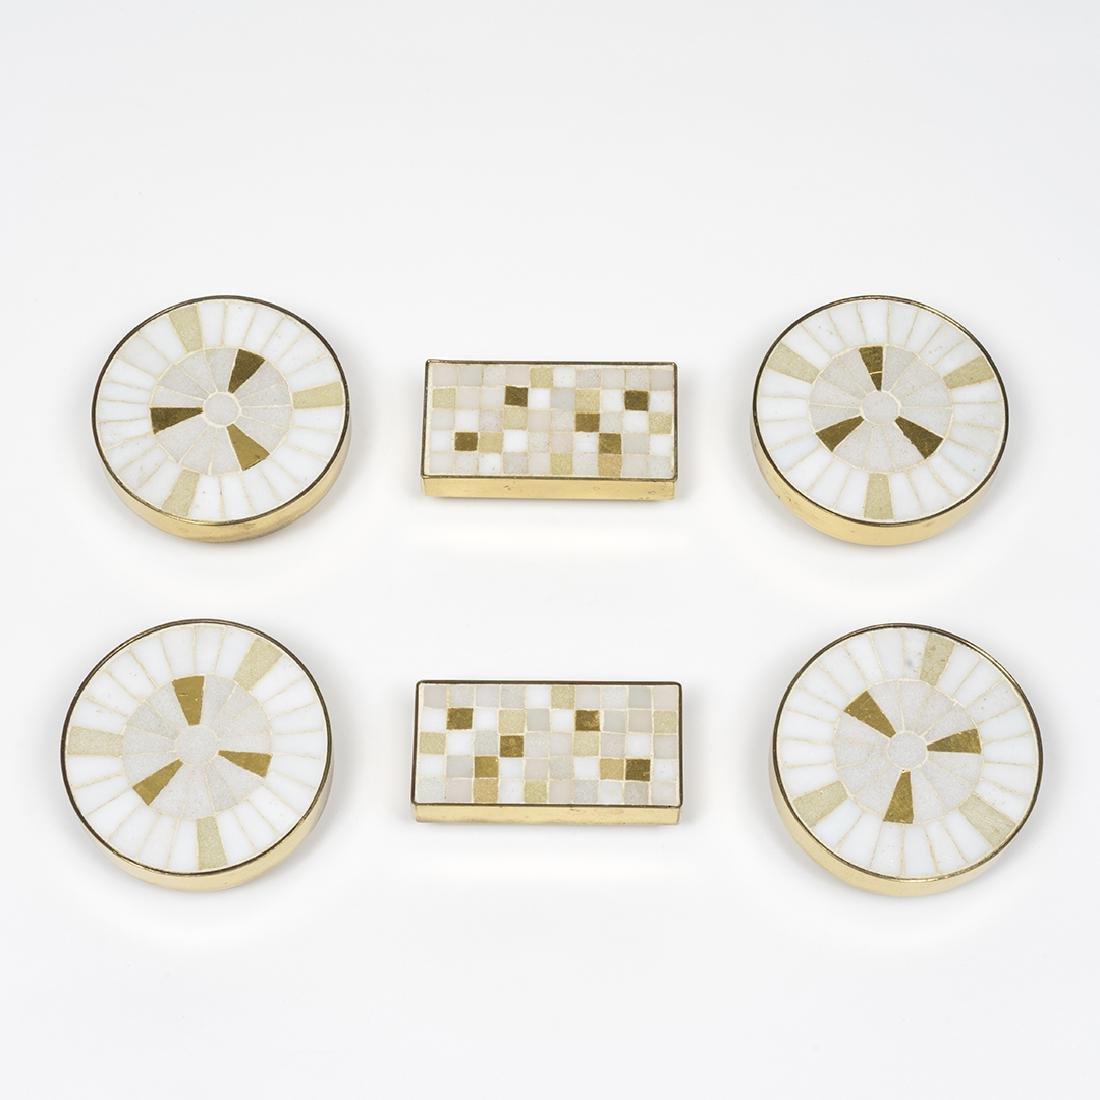 Tiled Brass Cabinet Pulls - 2